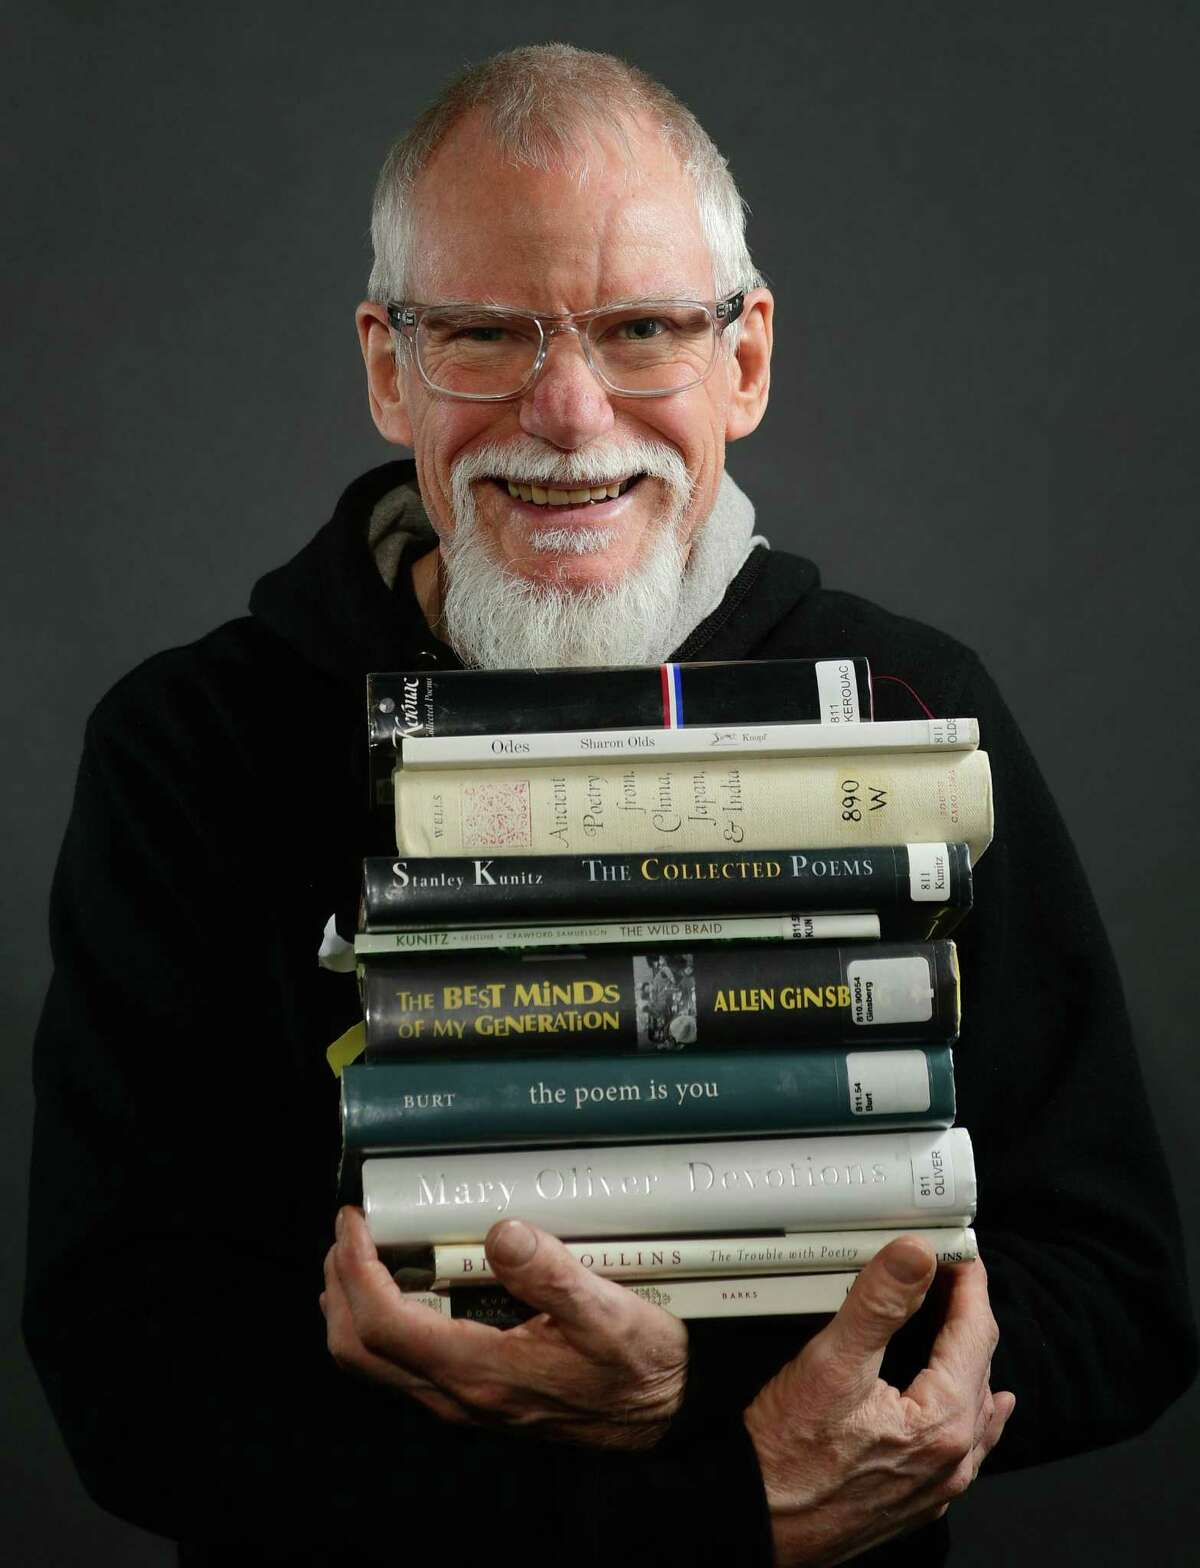 The new Norwalk Poet Laureate, William Hayden, at Hearst Connecticut Media offices Friday, April 12, 2019, in Norwalk, Conn.